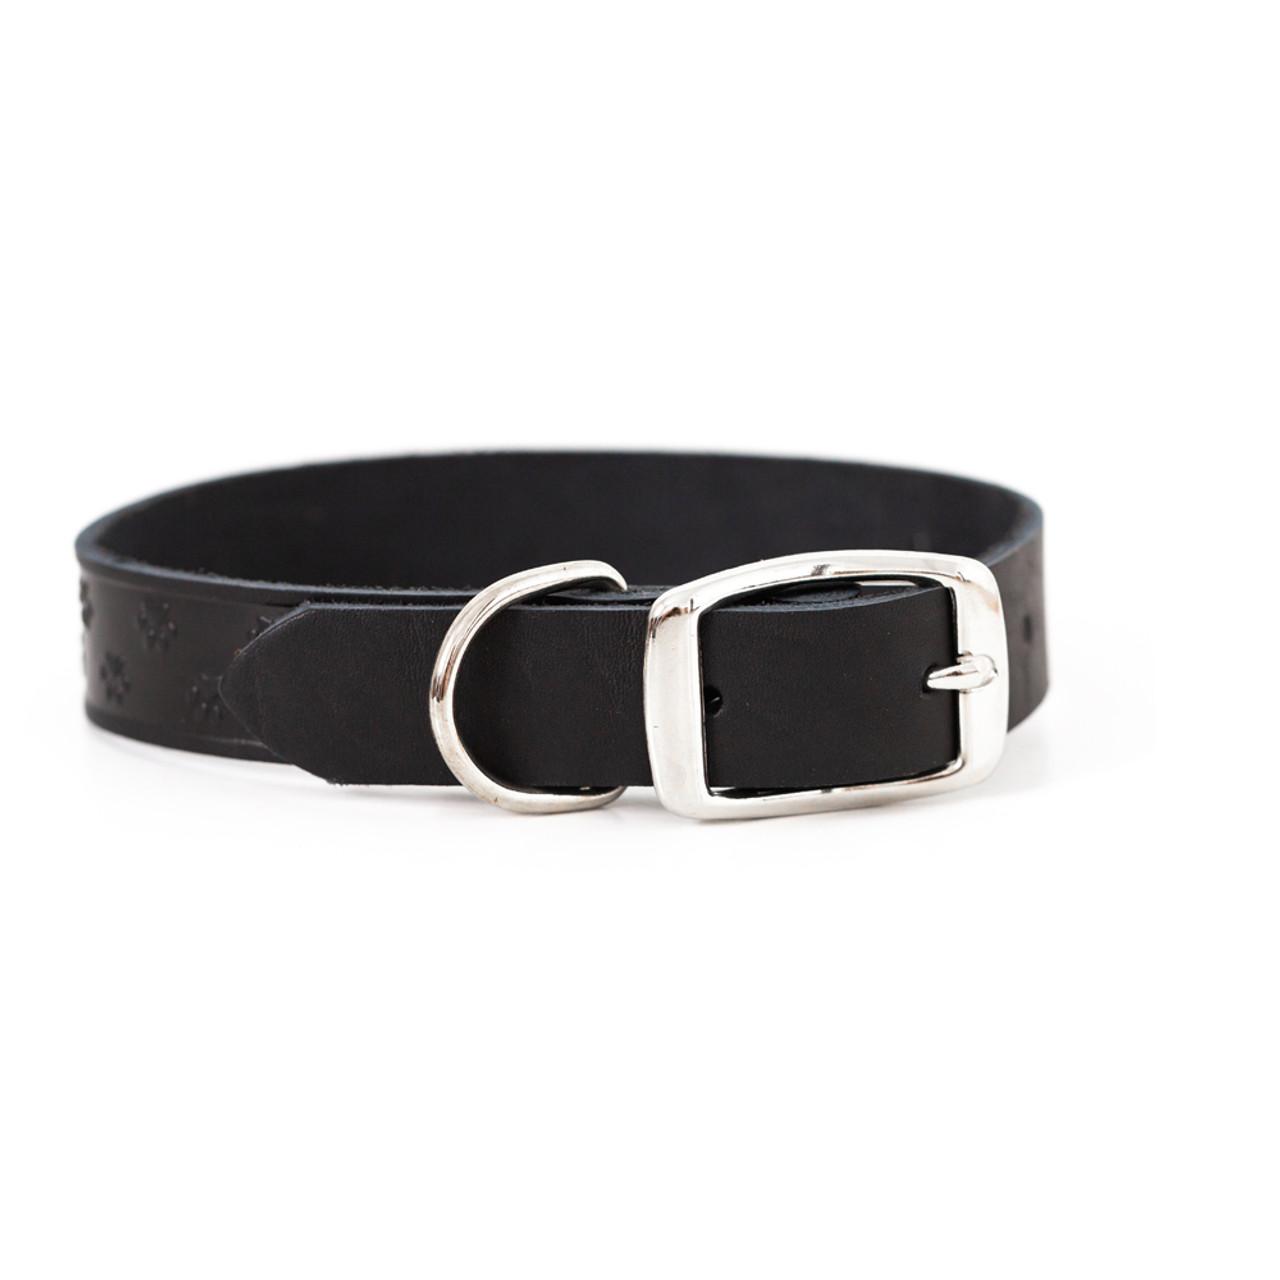 Classy Elegant Style Black Leather Dog Collar